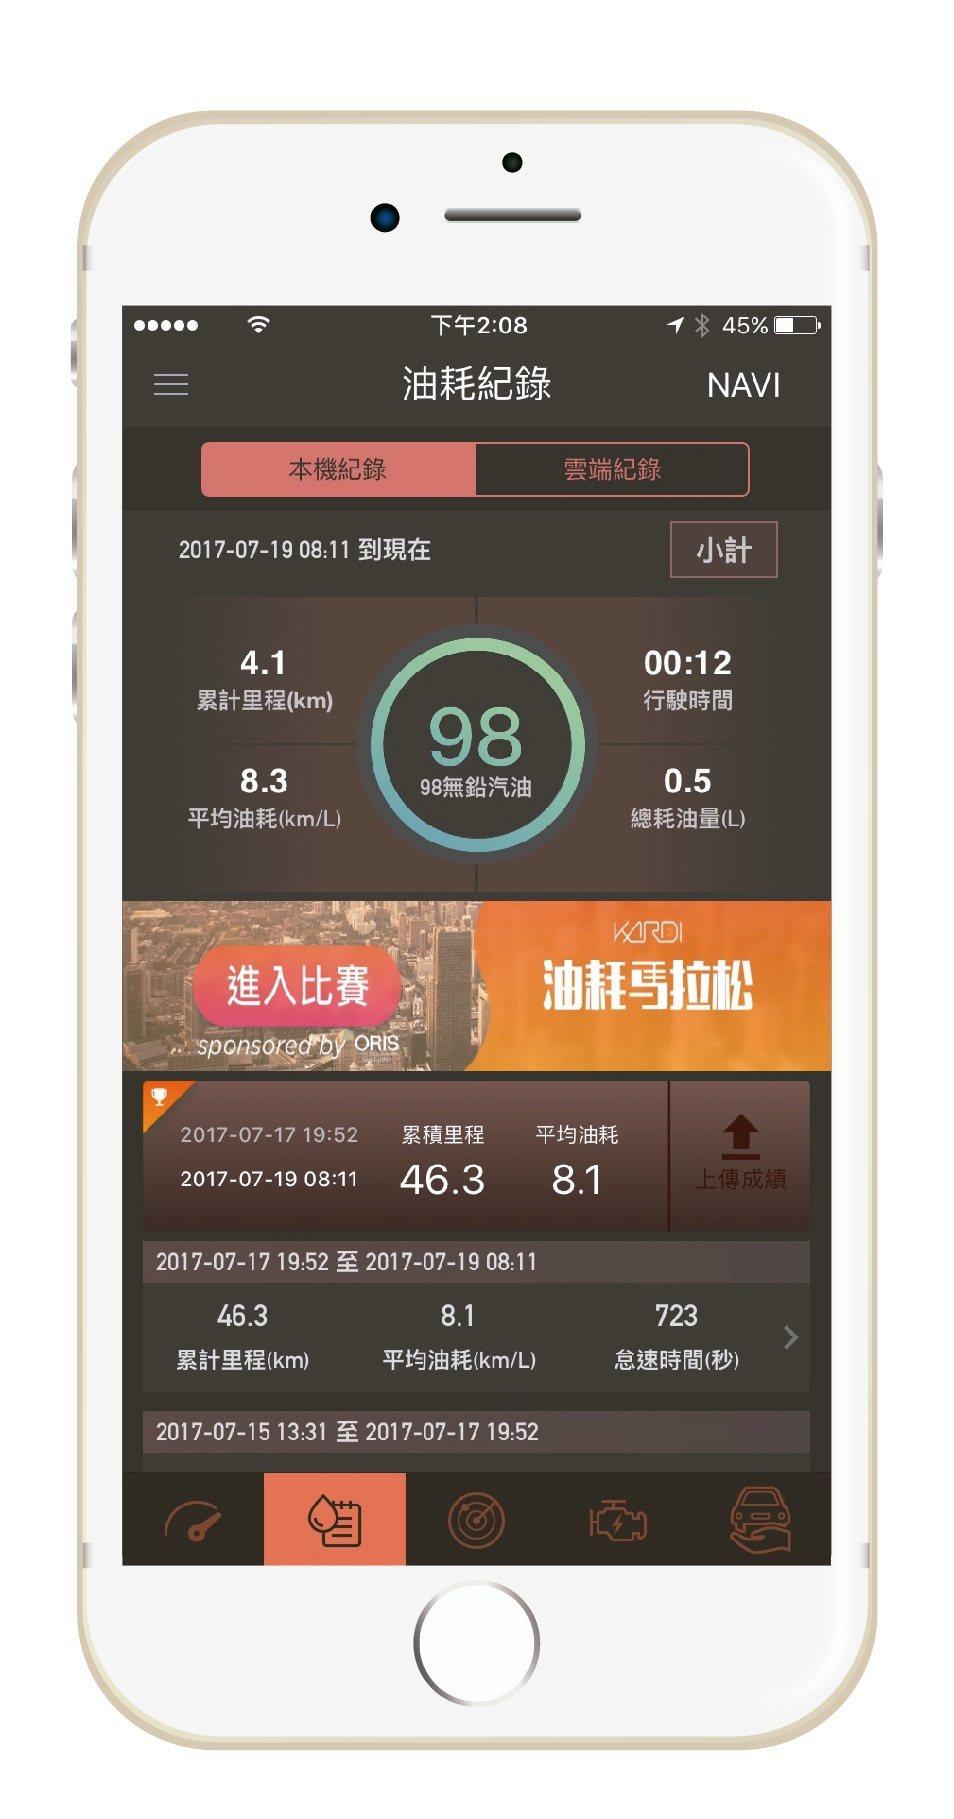 KARDI LiTE油耗記錄,首創虛擬實境24小時油耗馬拉松競賽。 圖/創星物聯...